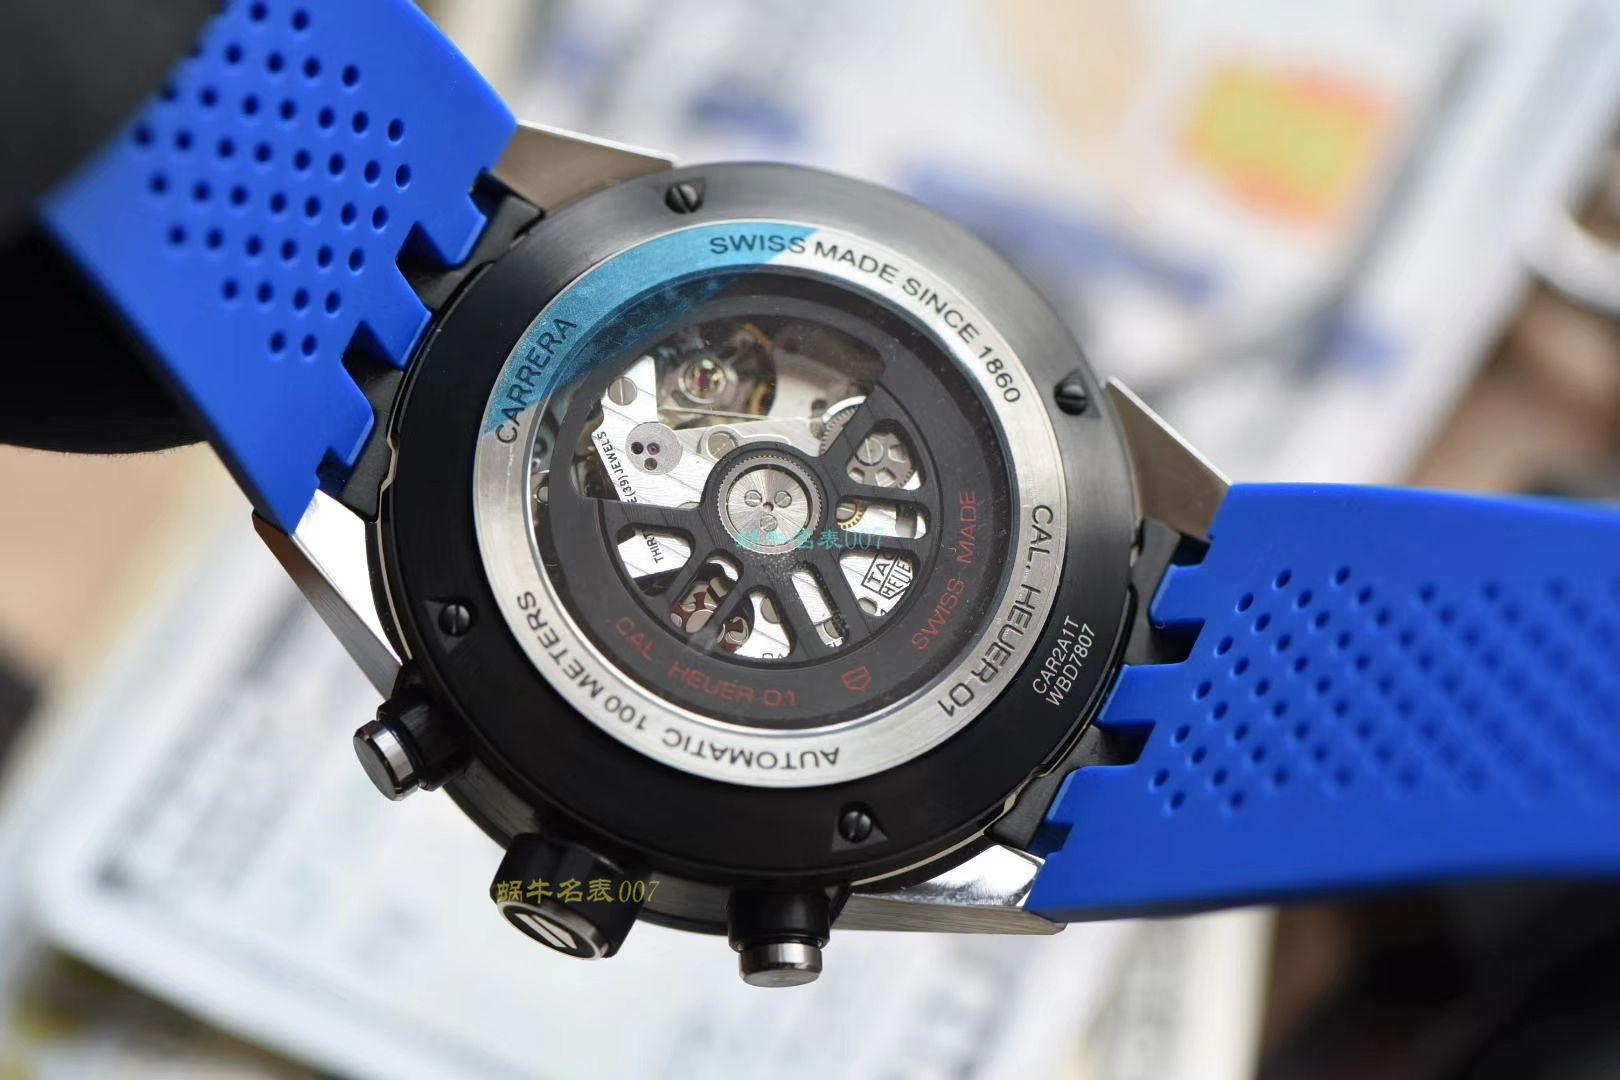 XF厂一比一精仿手表泰格豪雅卡莱拉系列CAR2A1T.FT6052腕表 / TG093